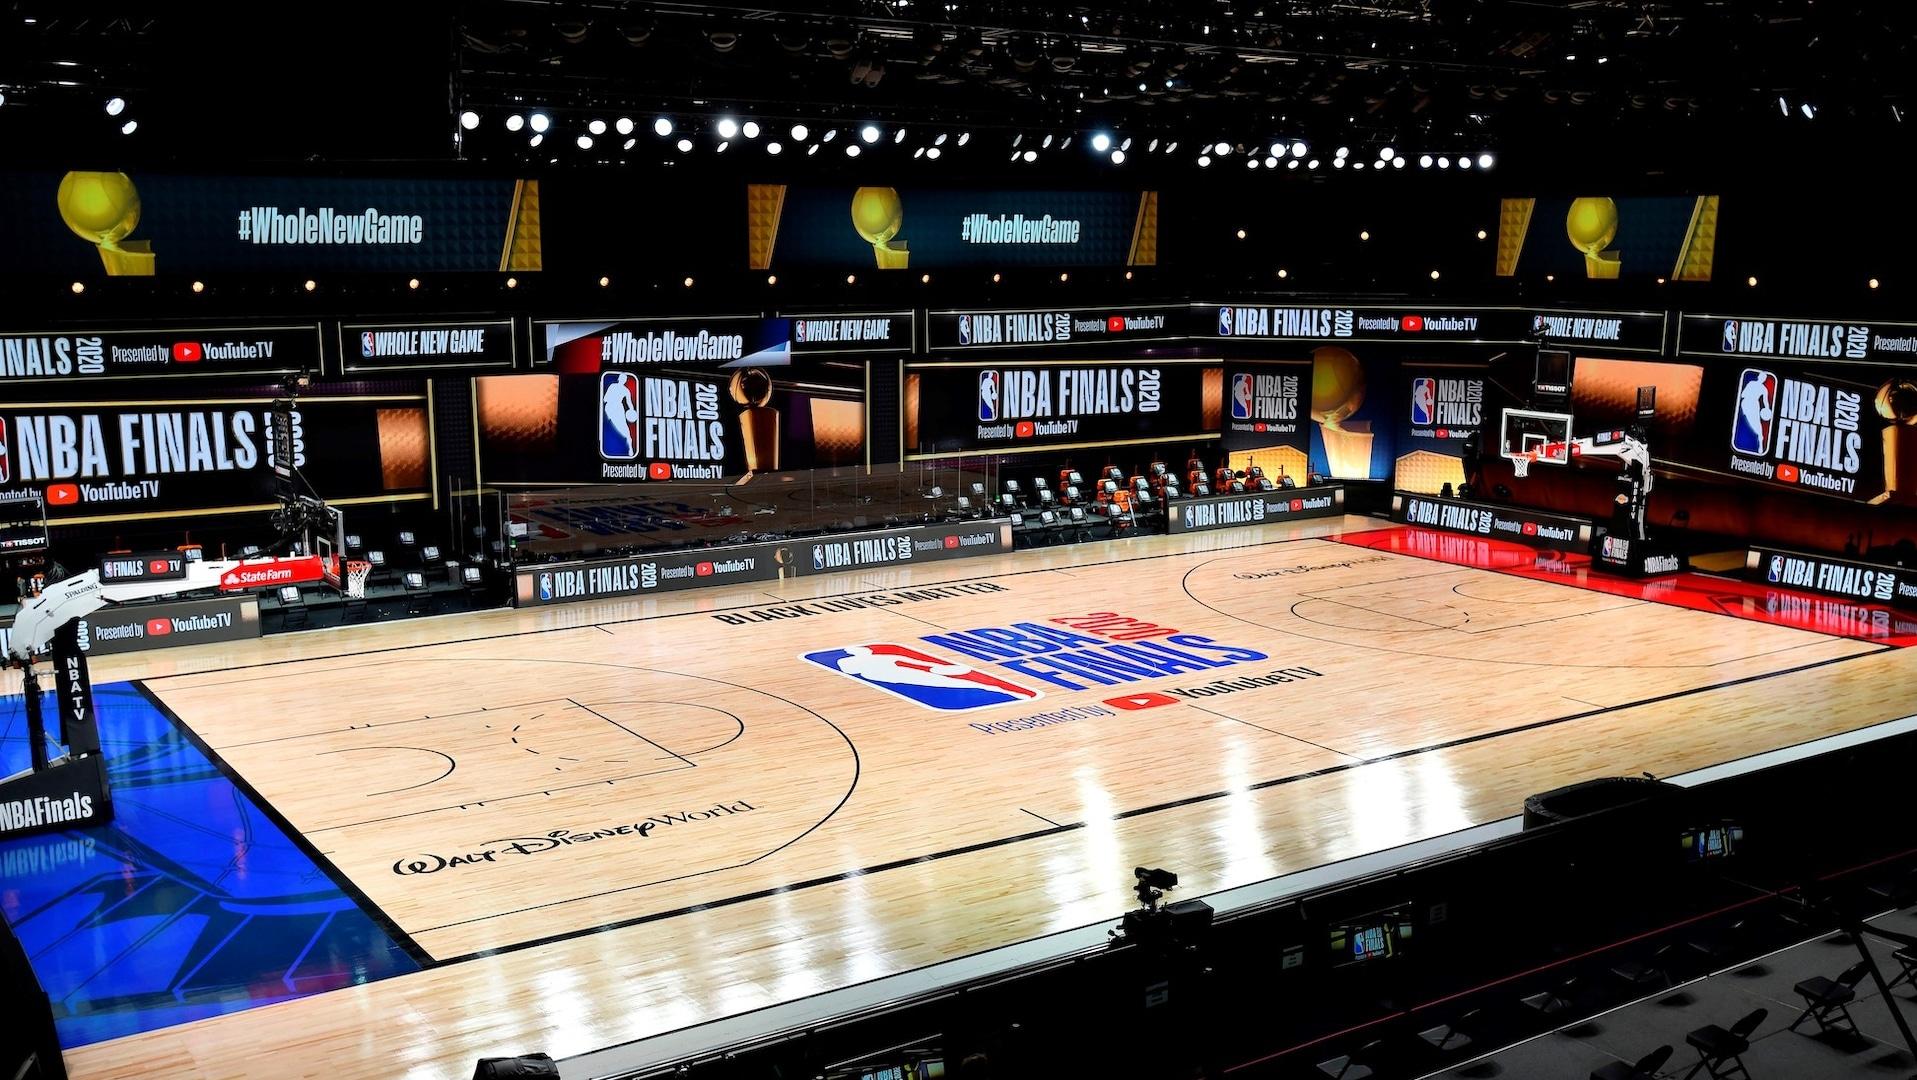 NBA unveils court design for 2020 NBA Finals